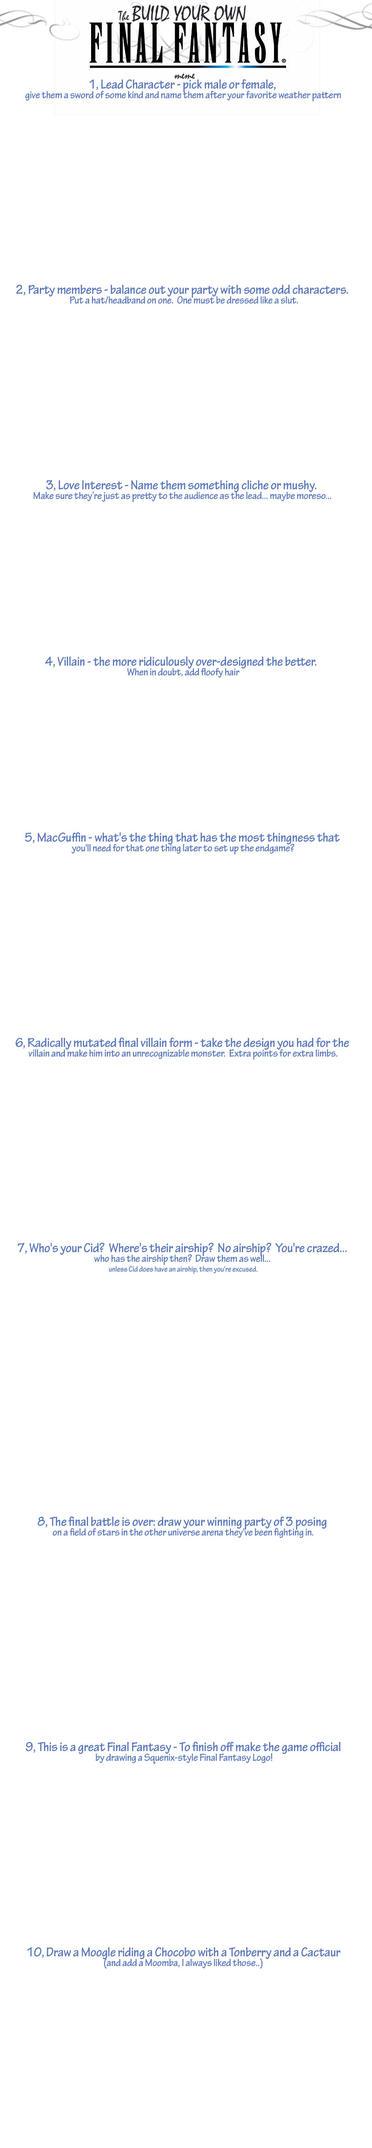 Build a Final Fantasy Meme by jameson9101322